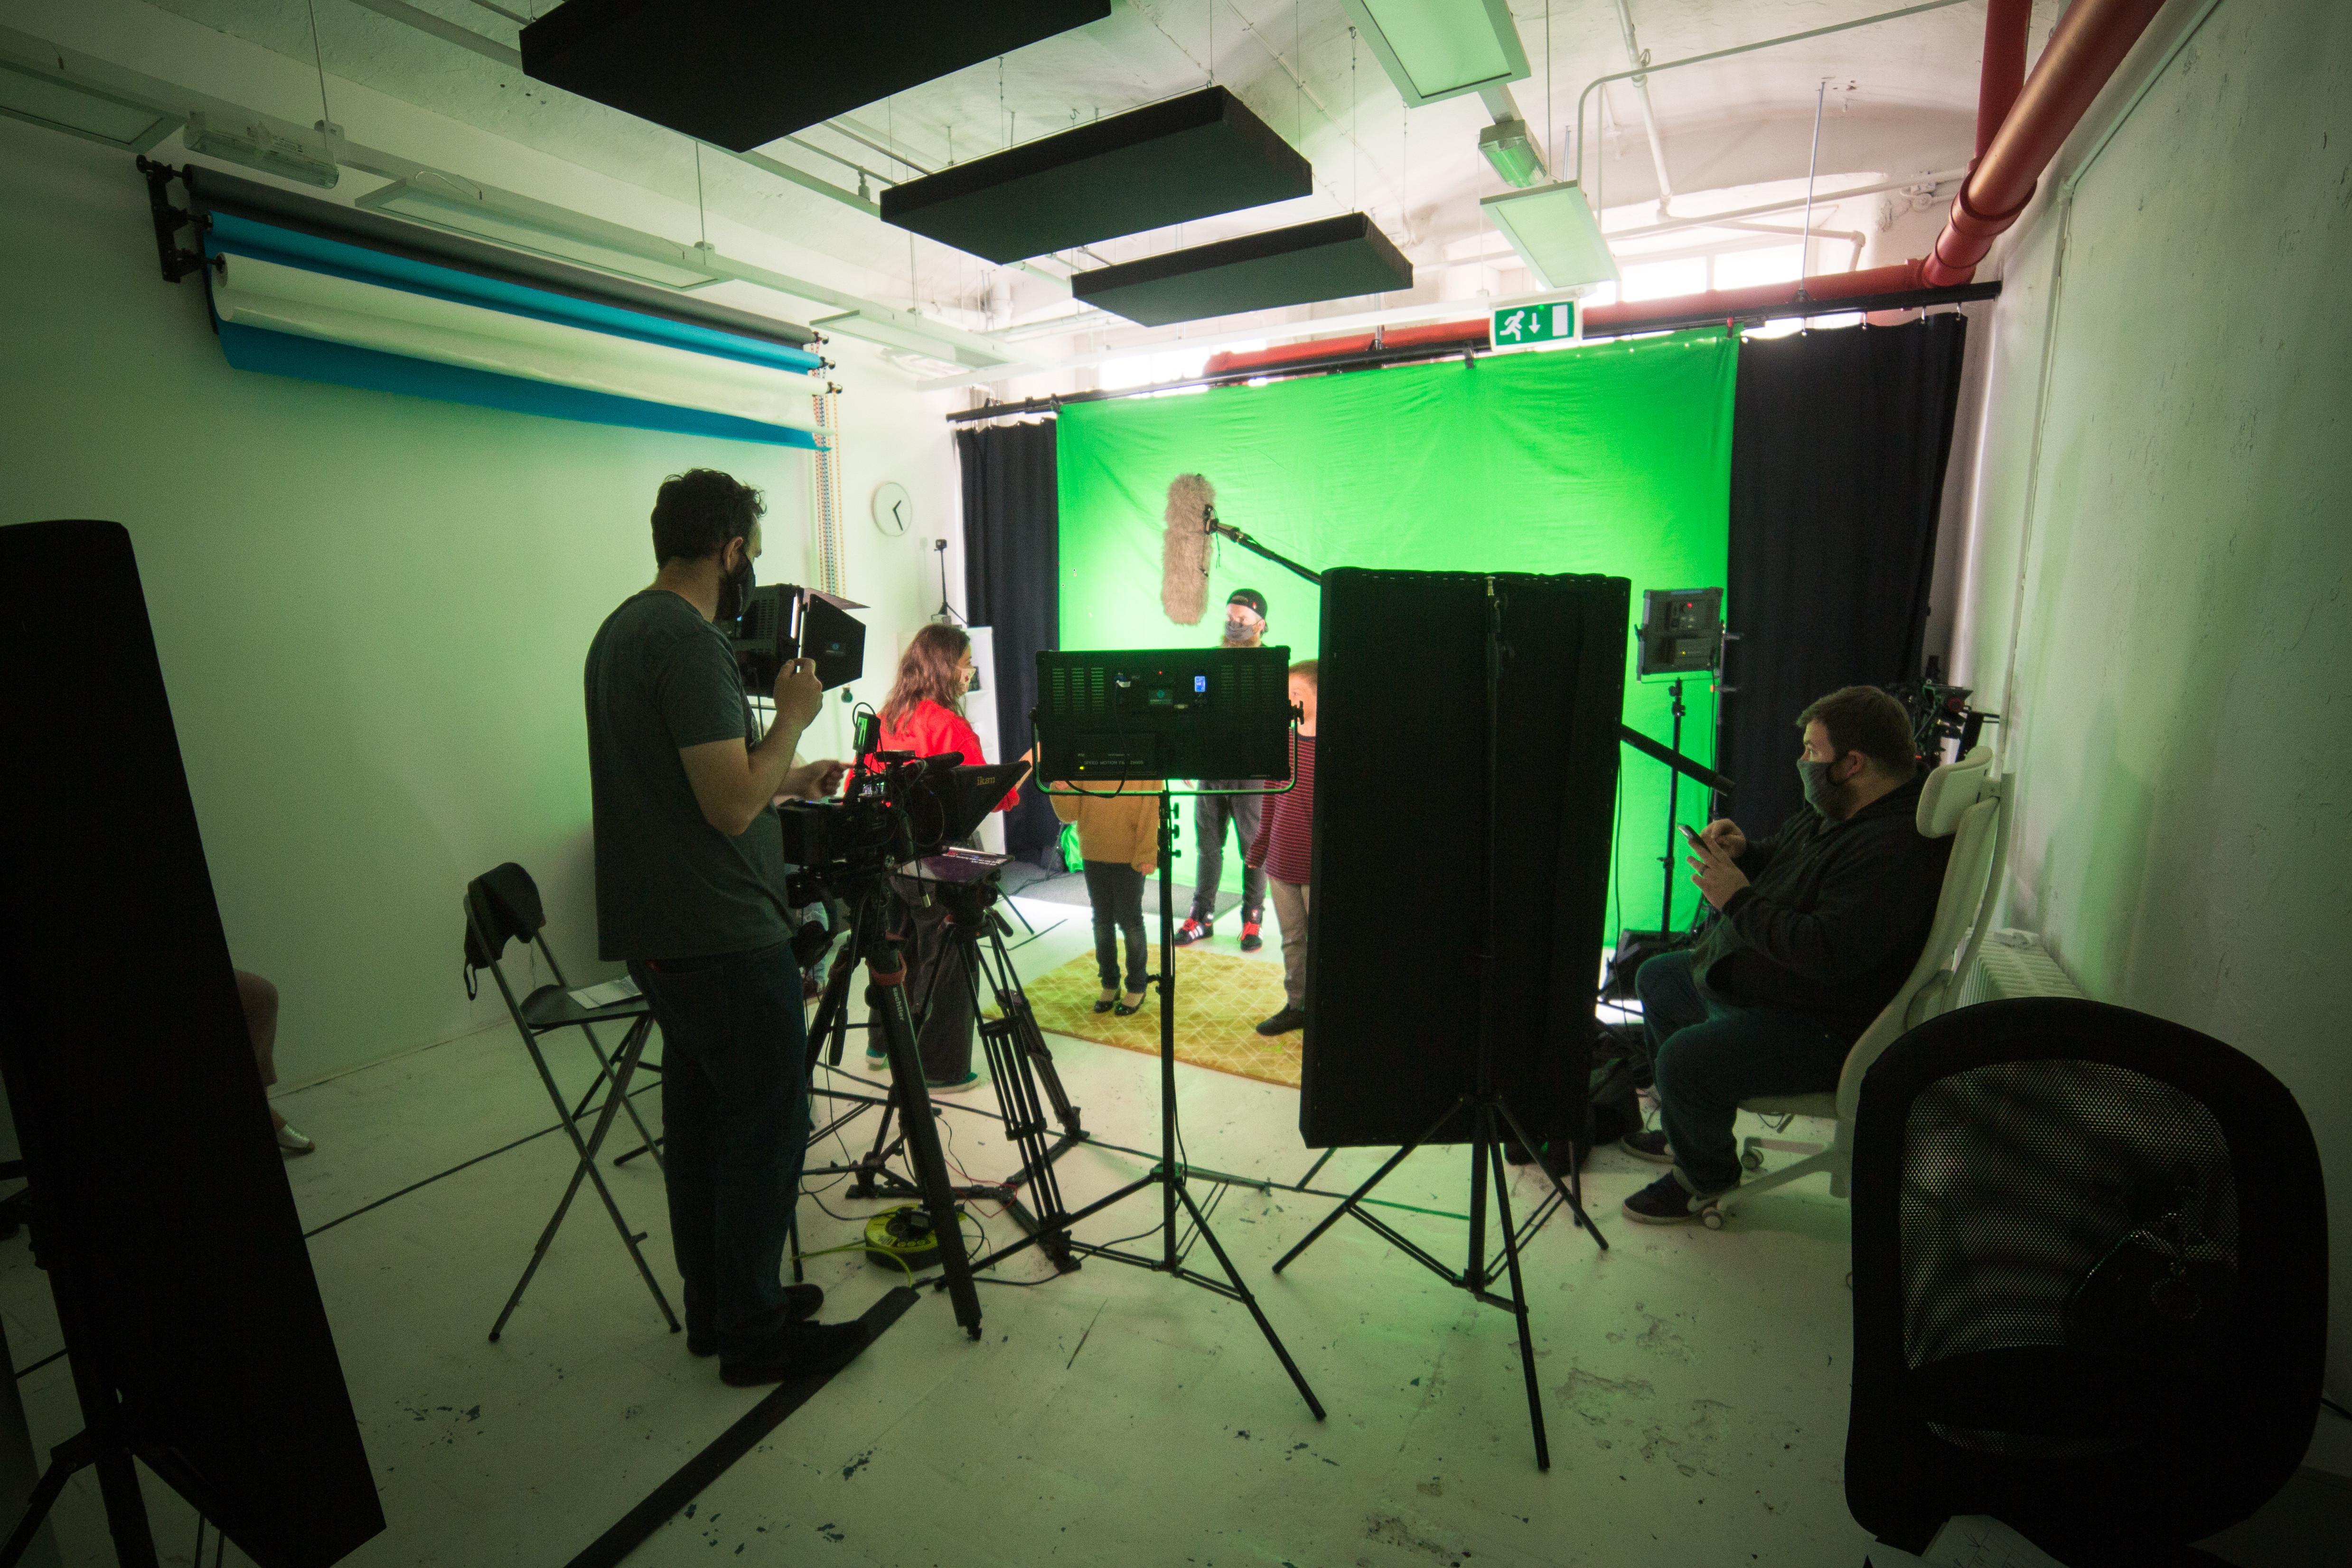 Studio Hire - 1/2 Day